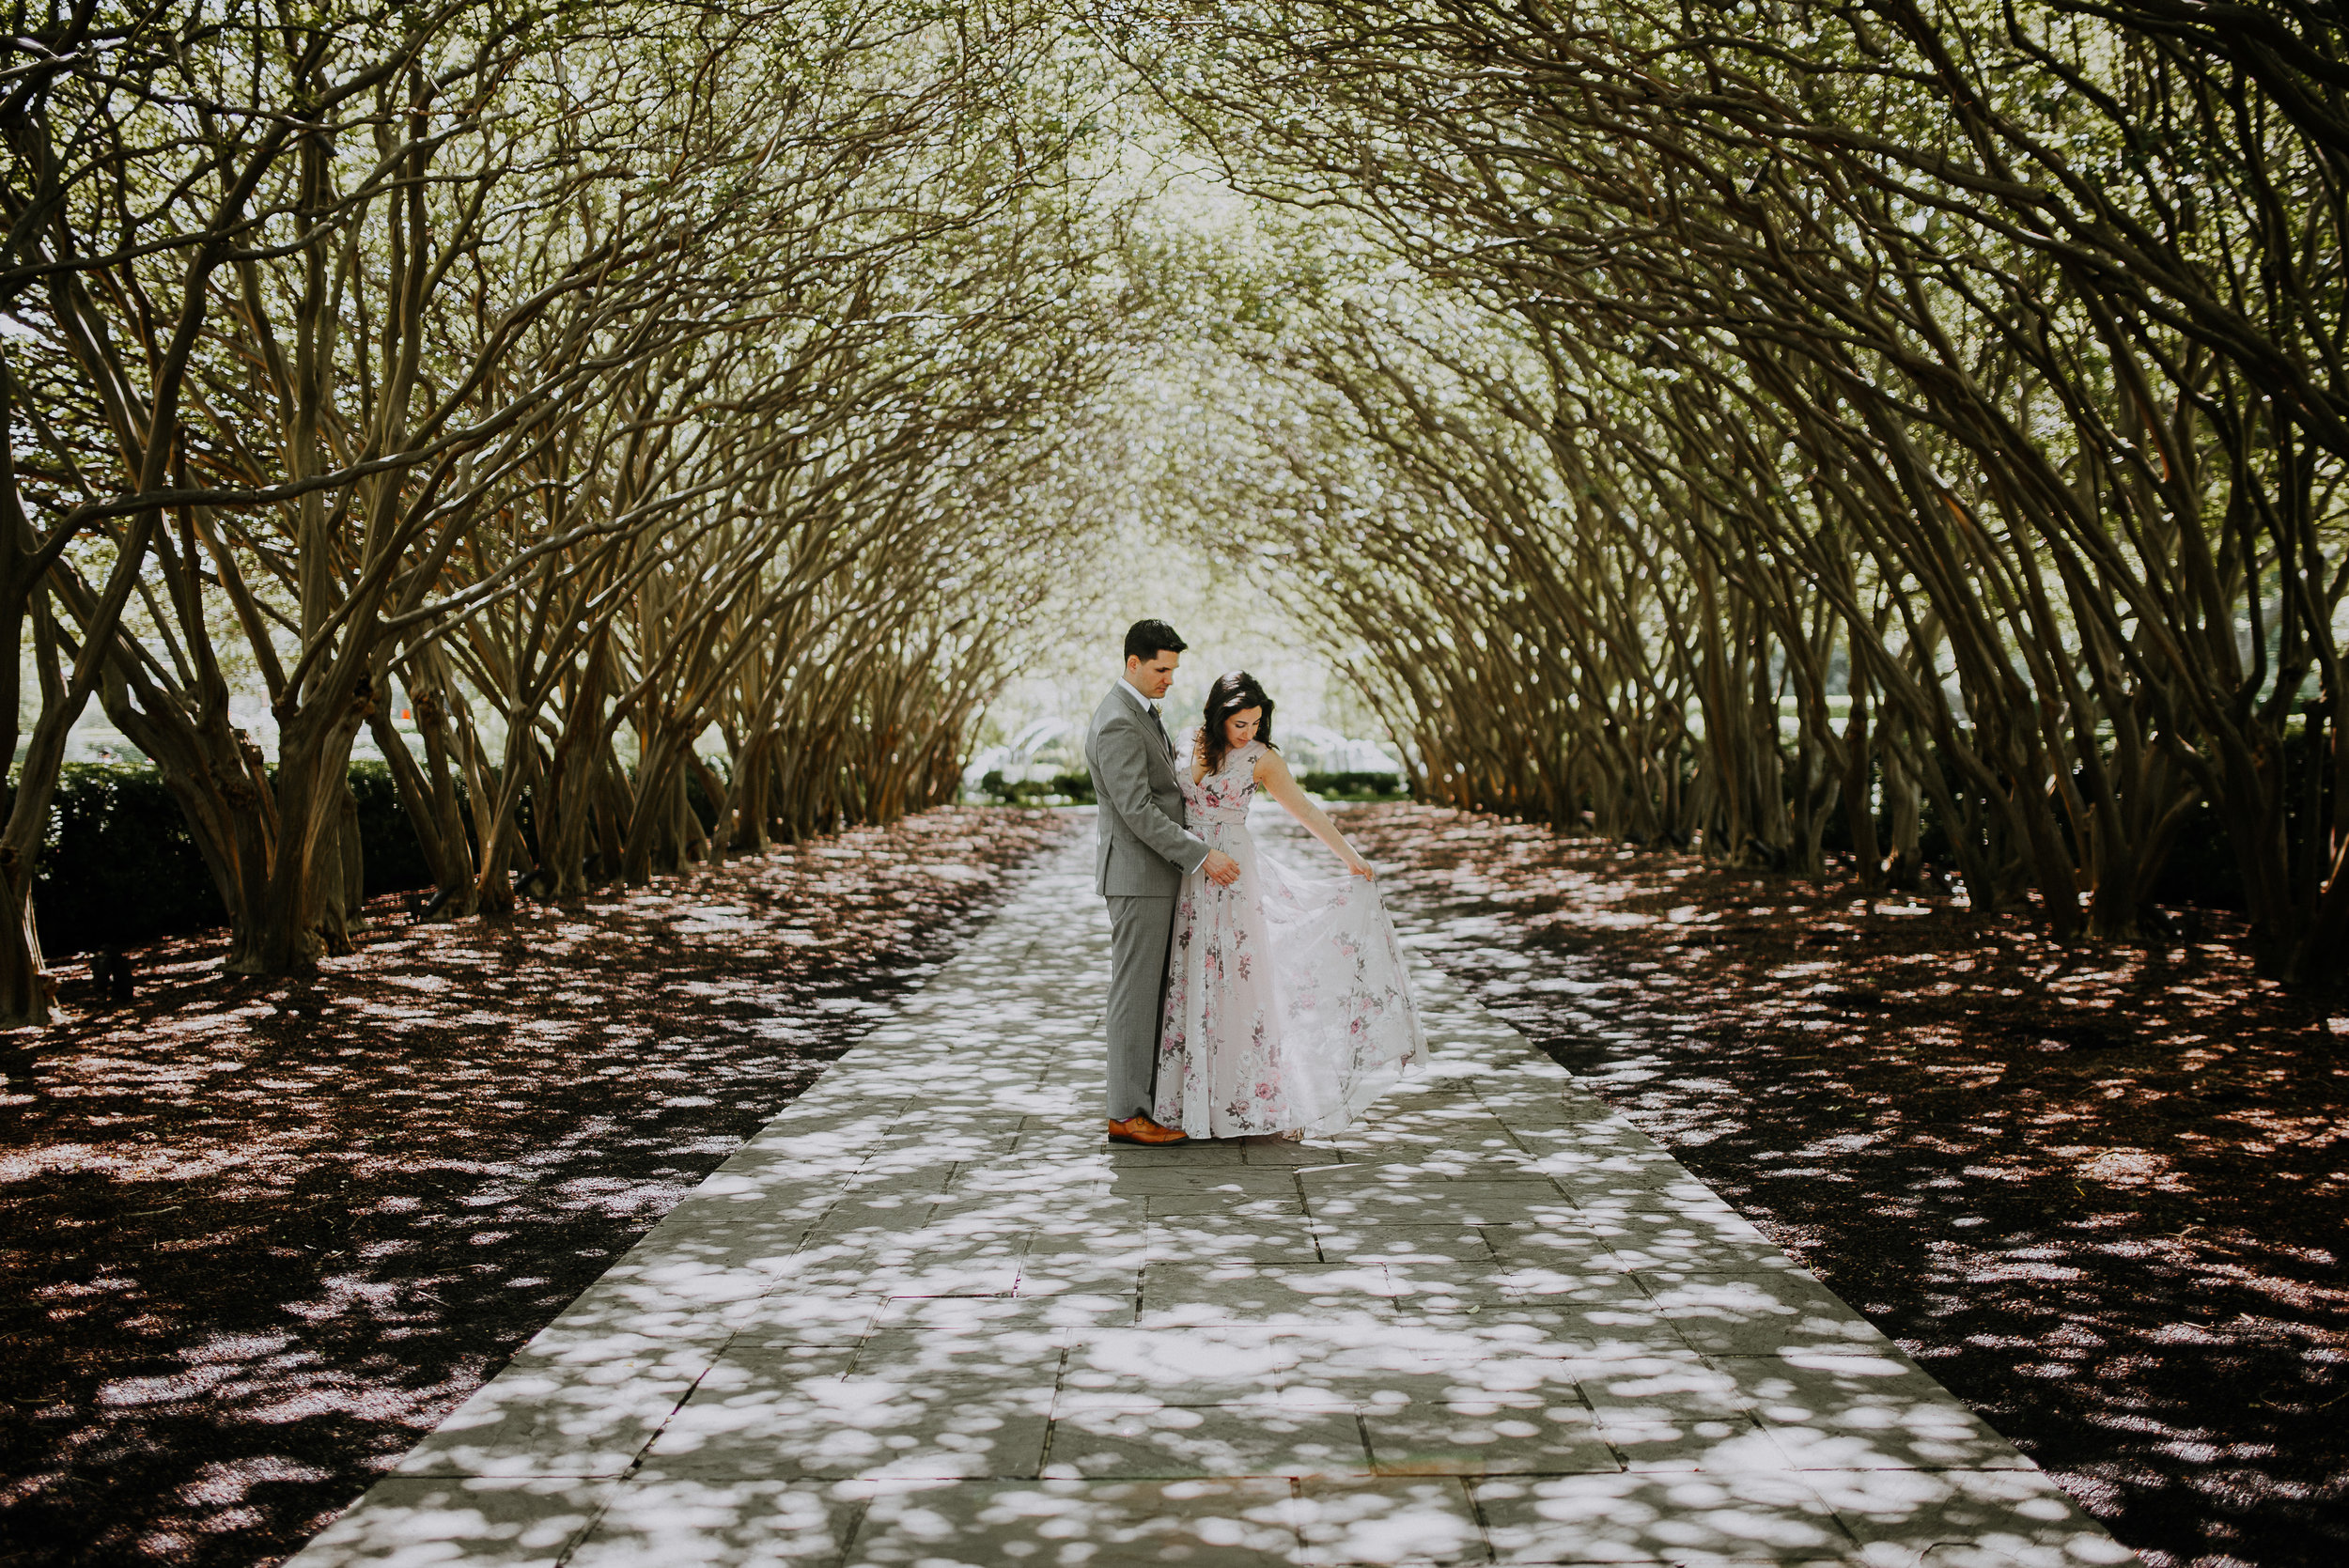 Dallas-fort-worth-wedding-photographer-dallas-arboretum-intimate-wedding-dallas-texas-20